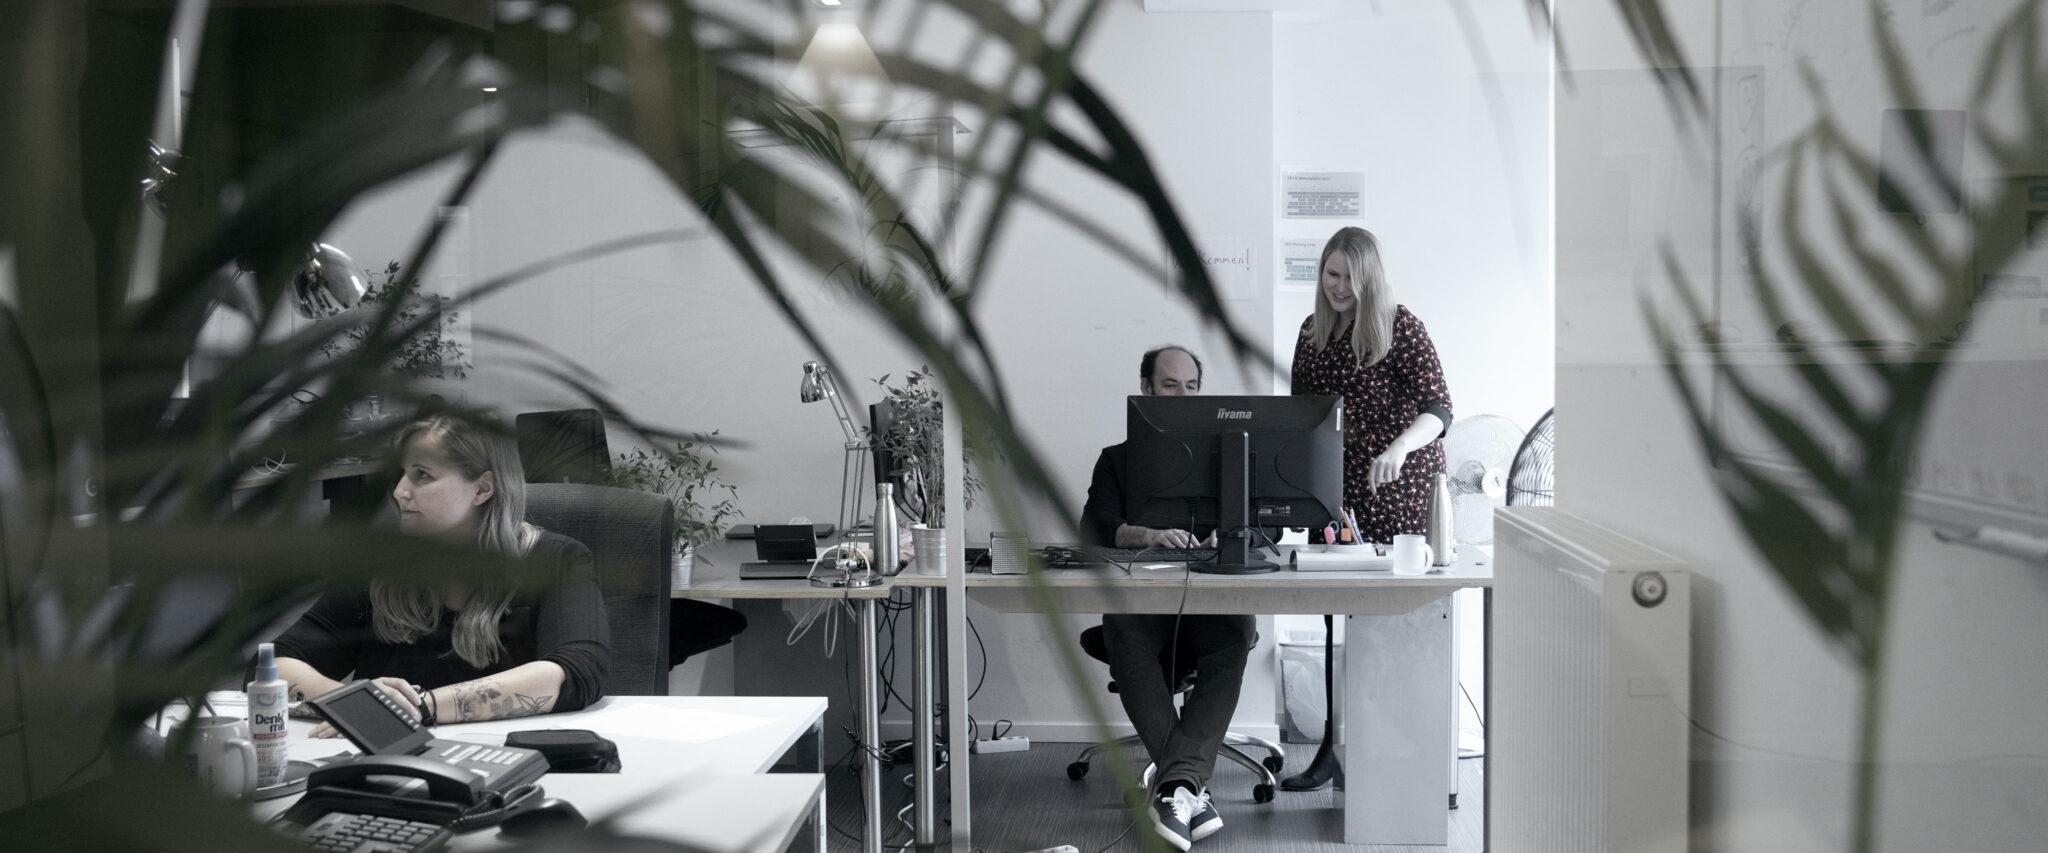 3 Personen im Büro